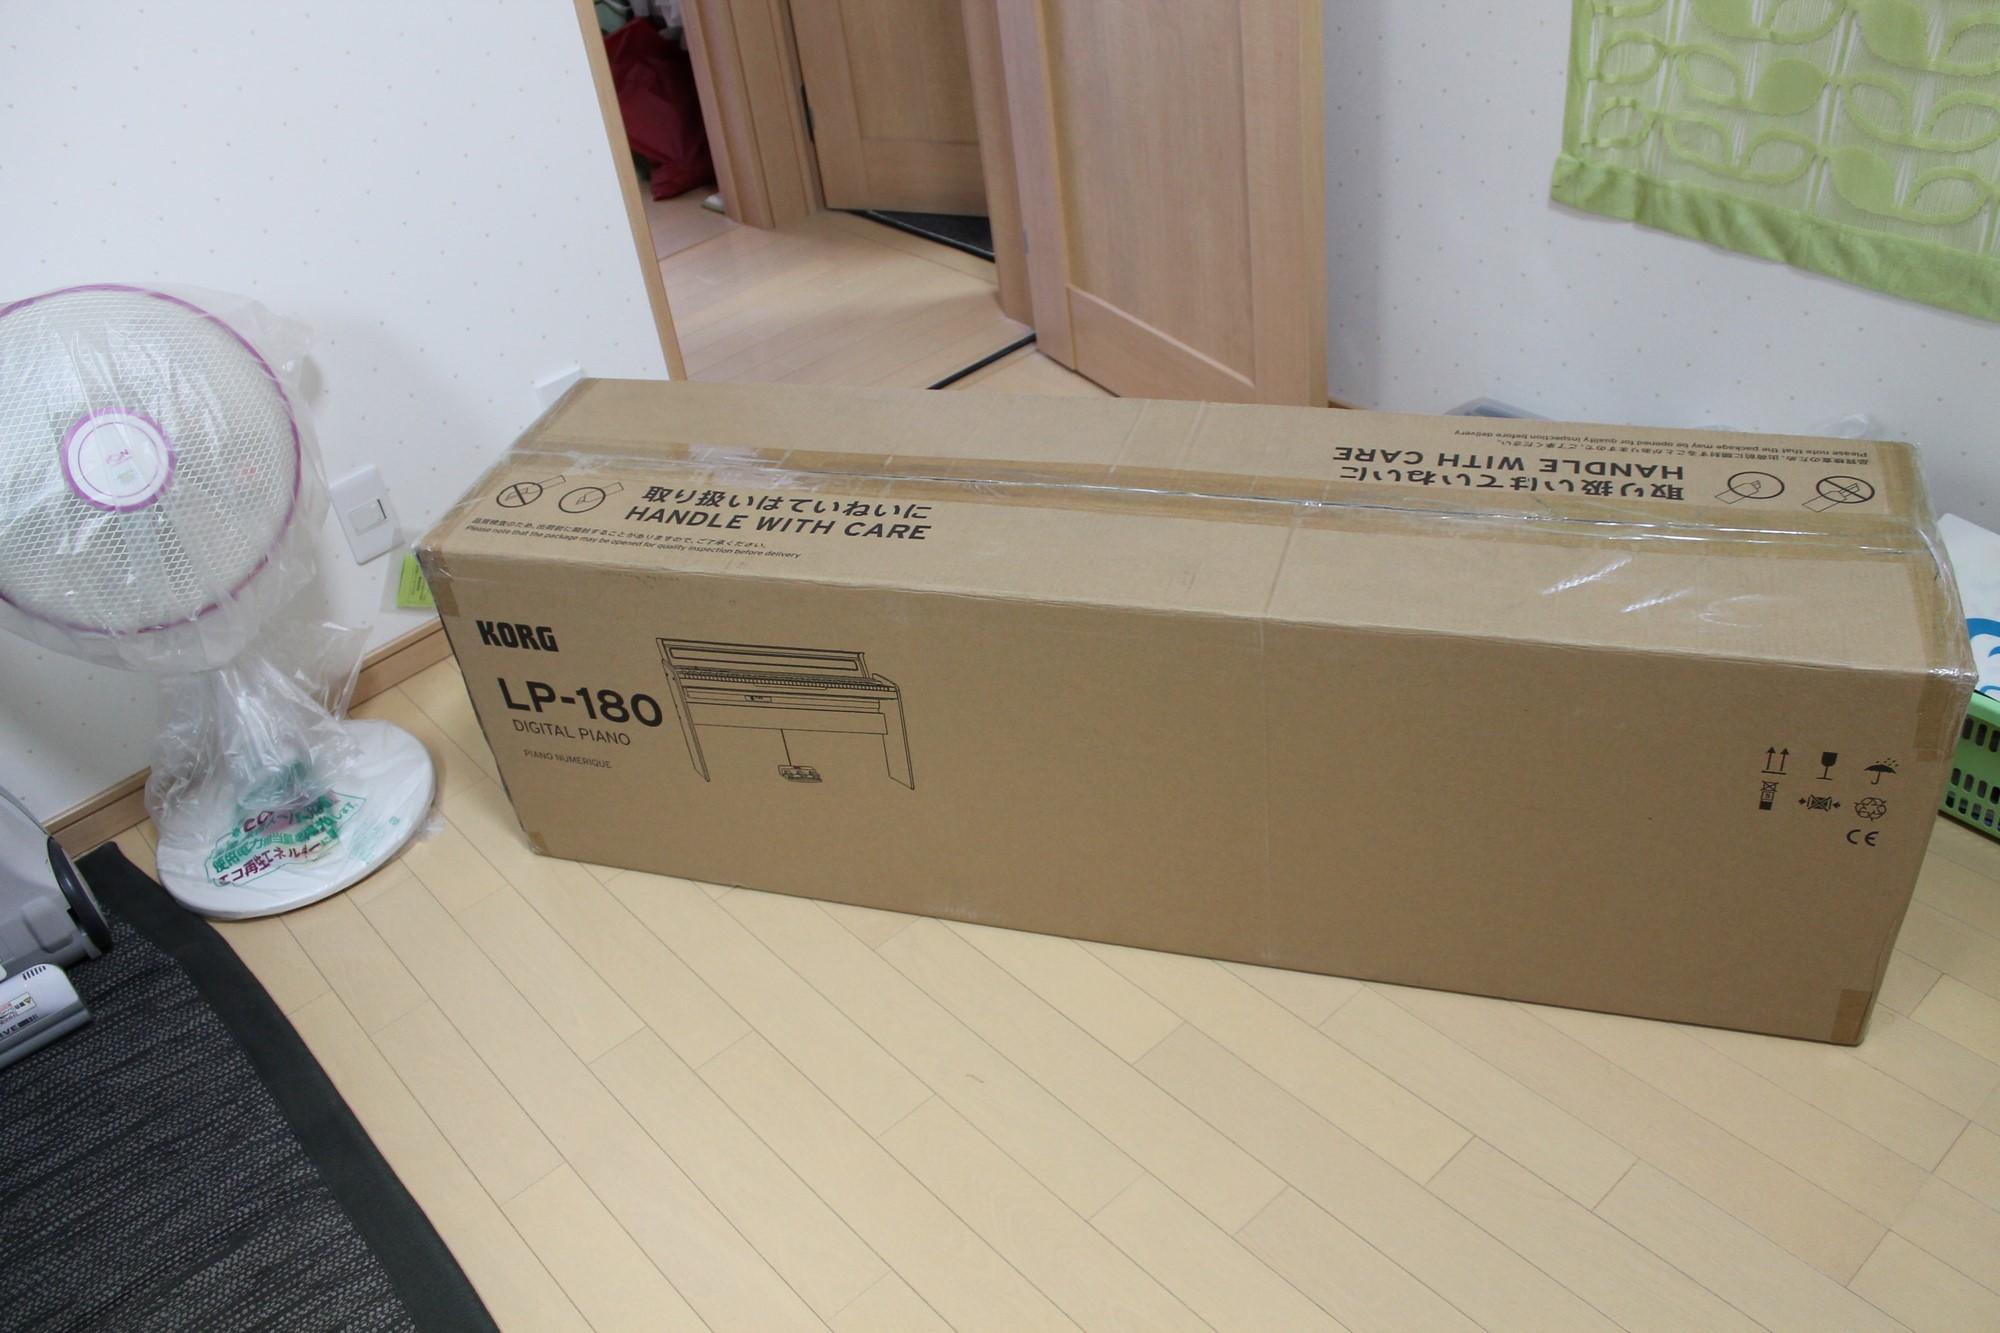 KORG 電子ピアノ LP-180 BK 届きました